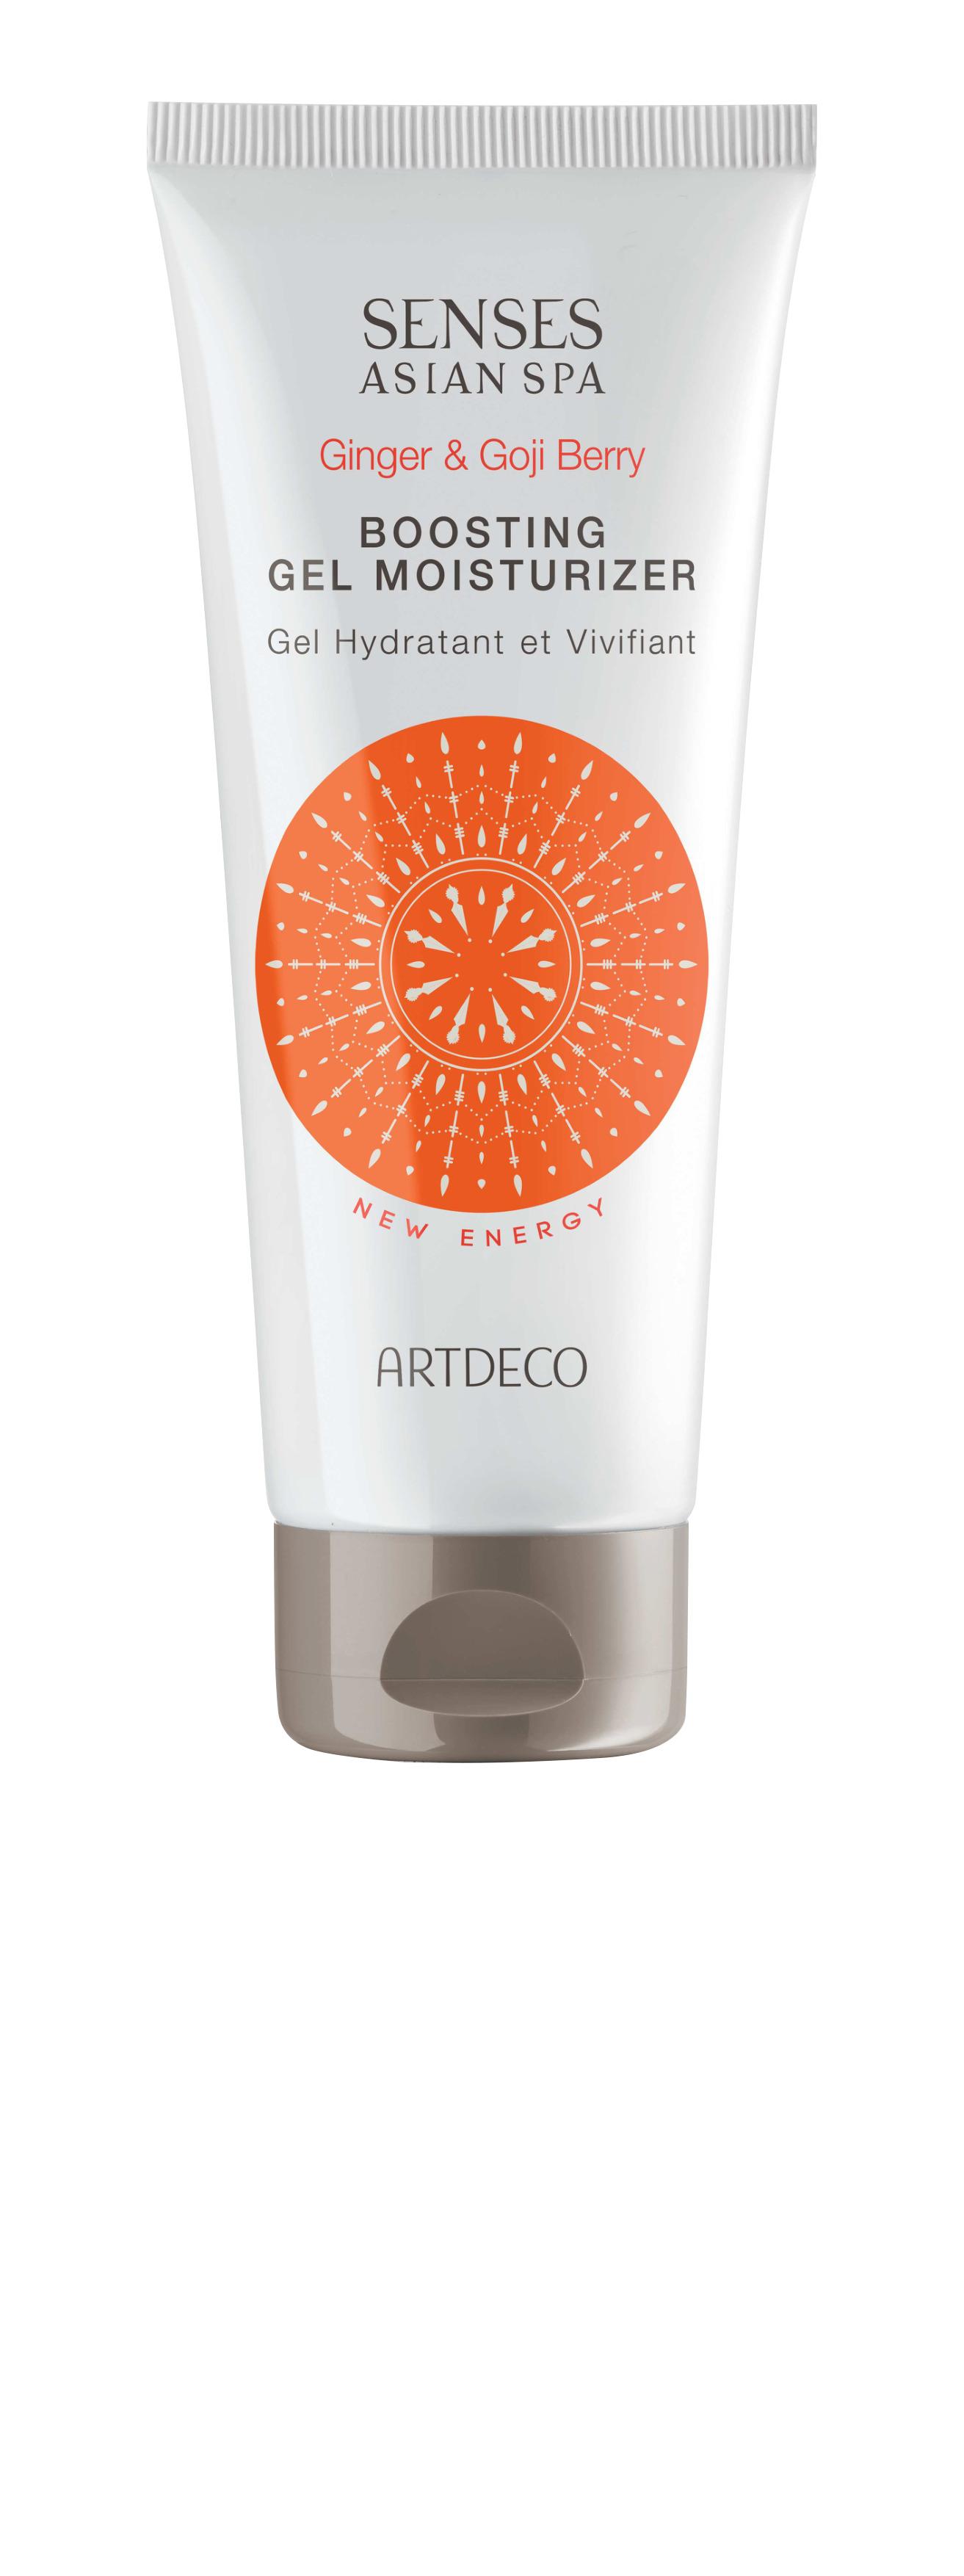 Artdeco гель для тела тонизирующий увлажняющий Boosting gel moisturizer, new energy, 200 мл